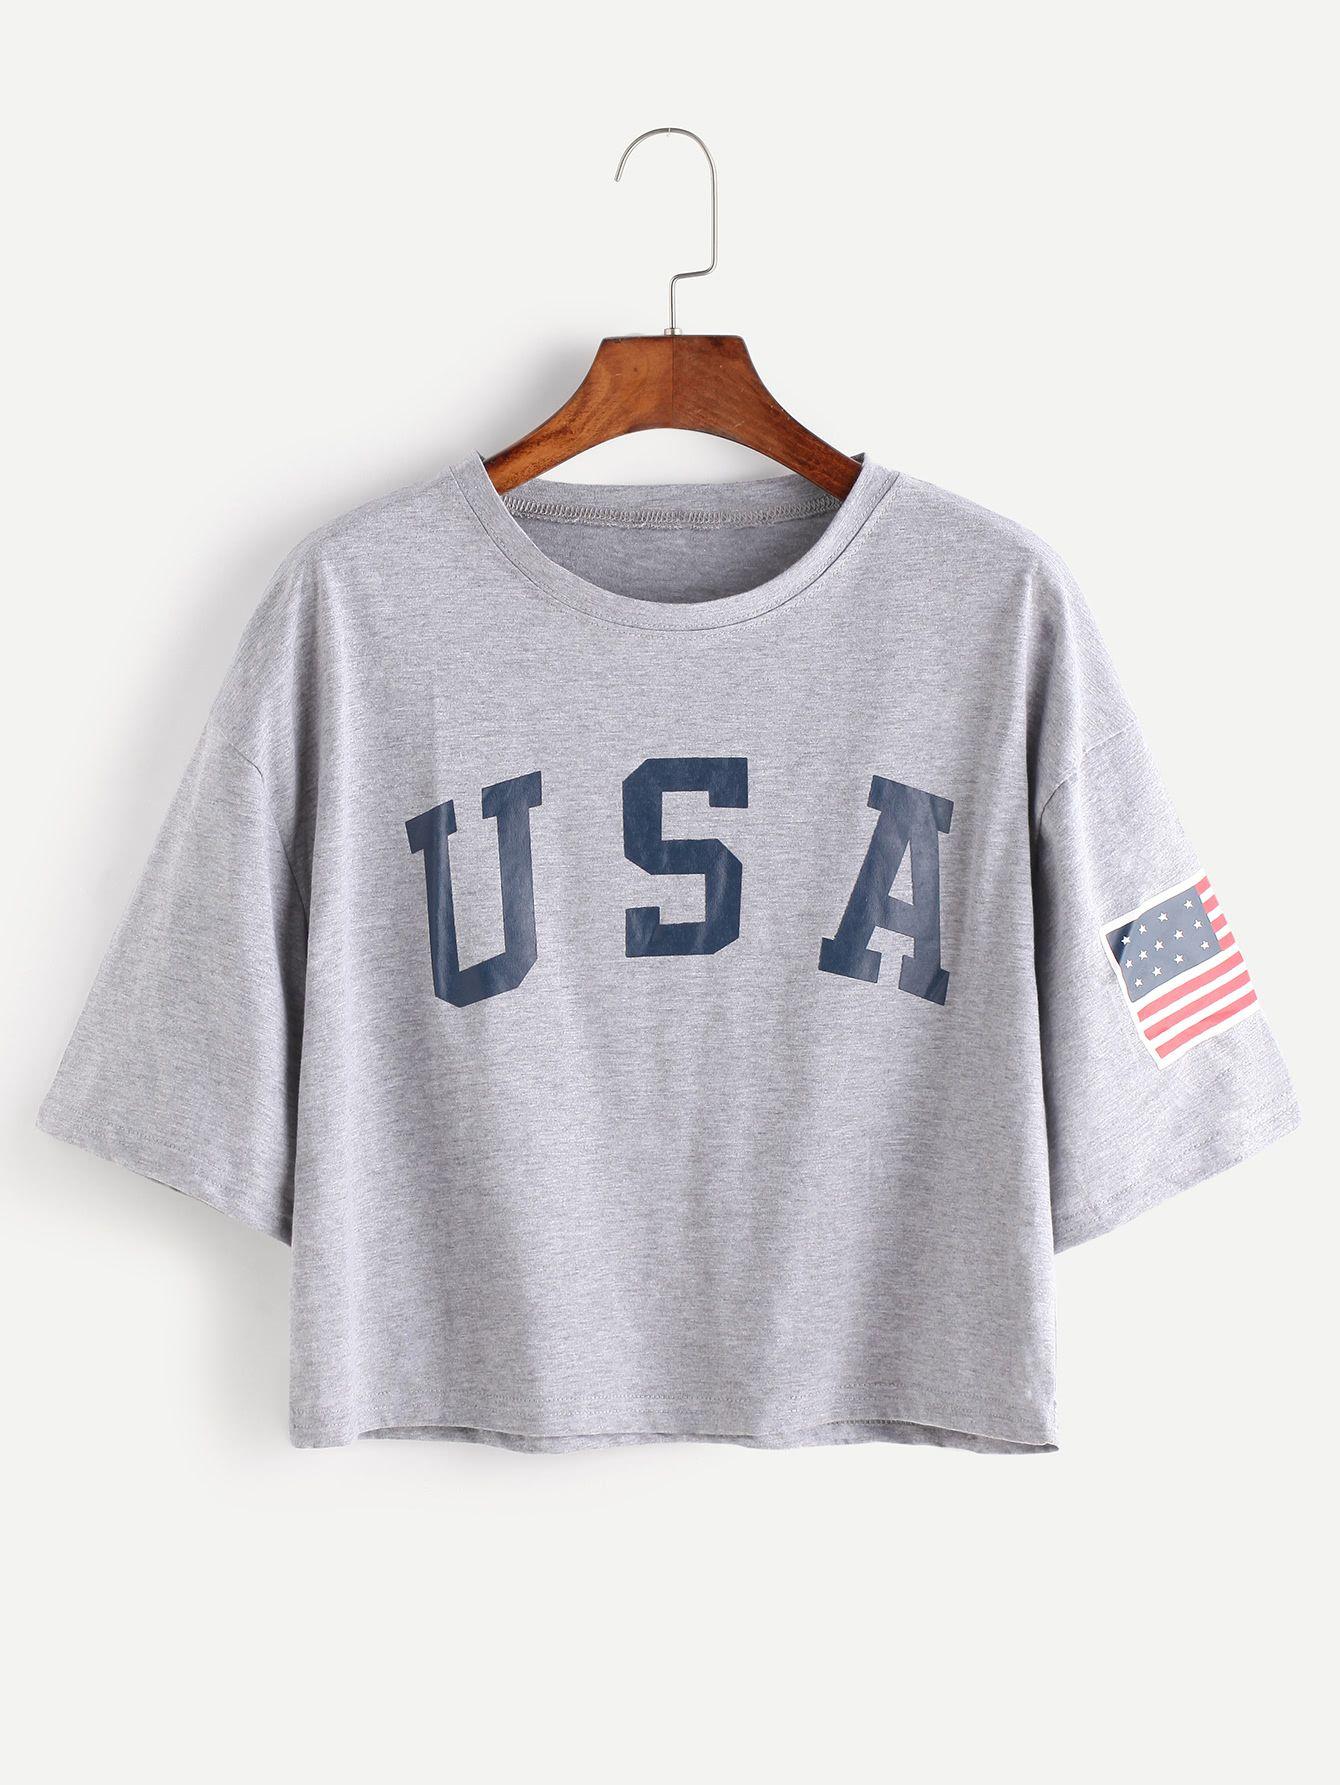 433e50eff7 American Flag Letter Print Drop Shoulder Tee -SheIn(Sheinside) Fashion  Dresses, Trendy